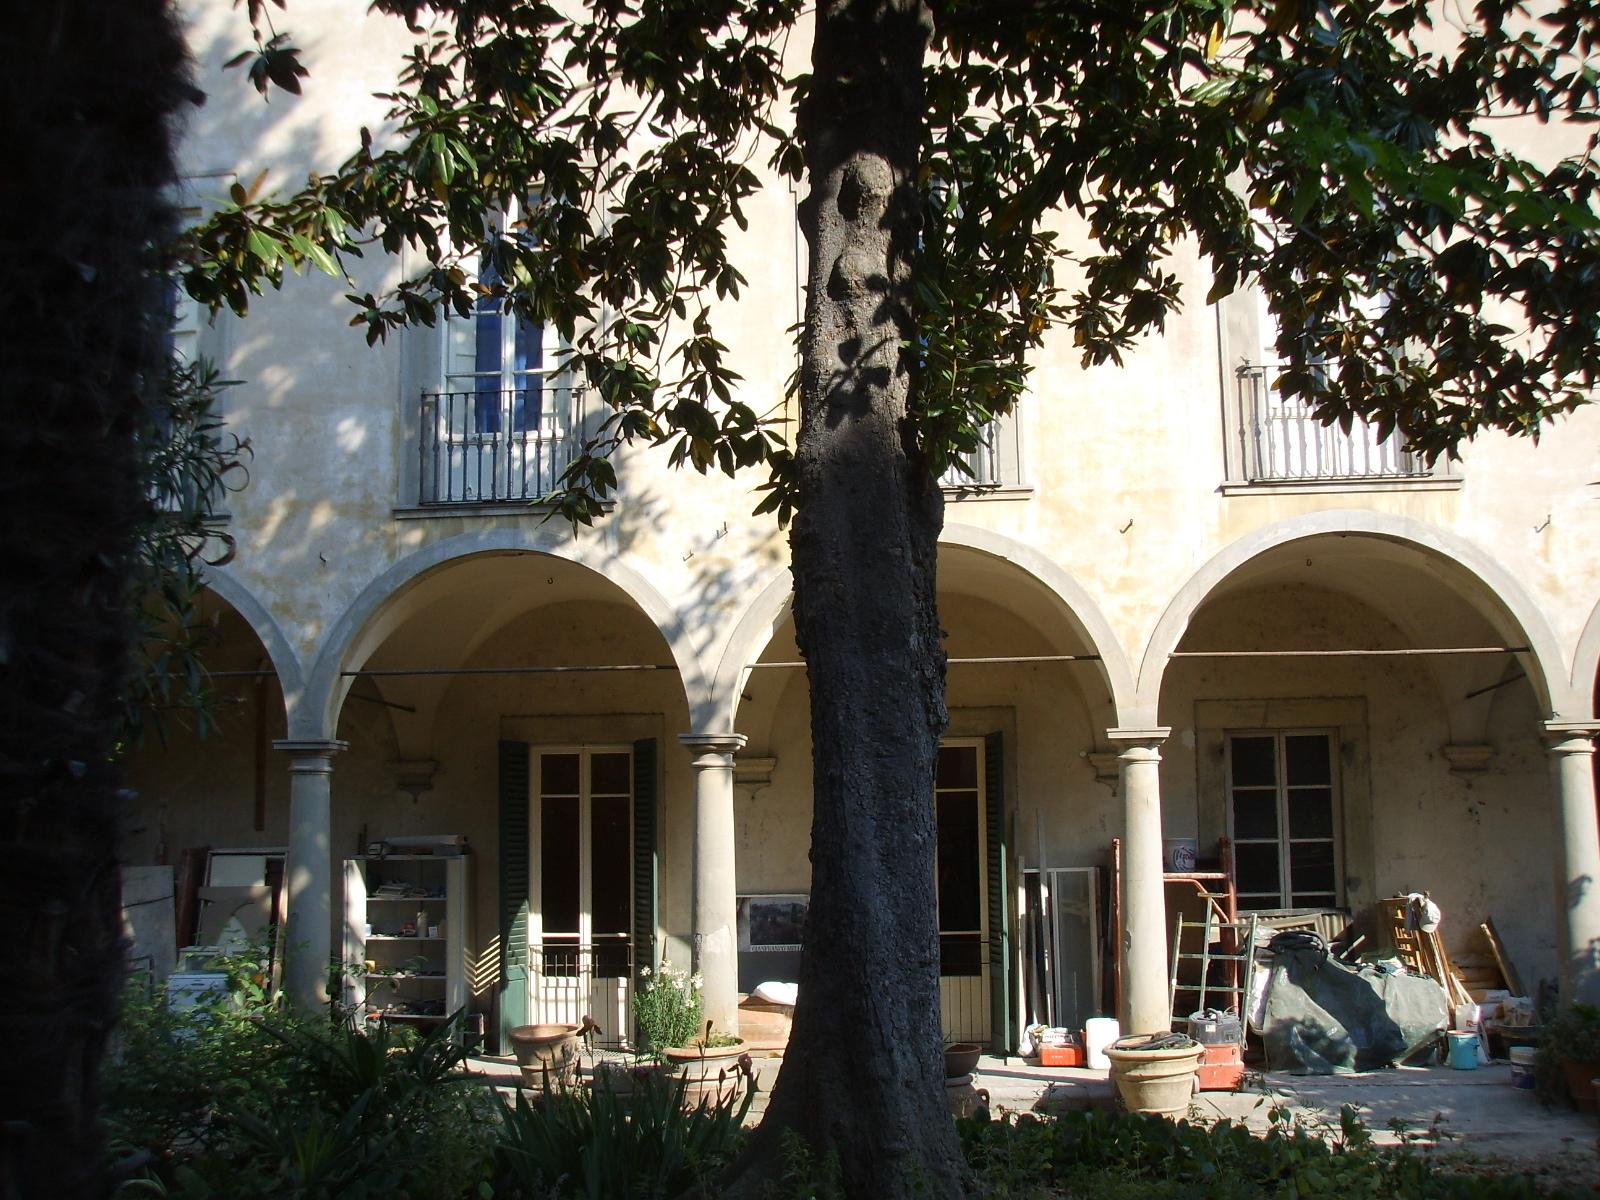 Palazzo_Roffia_giardino_05.JPG